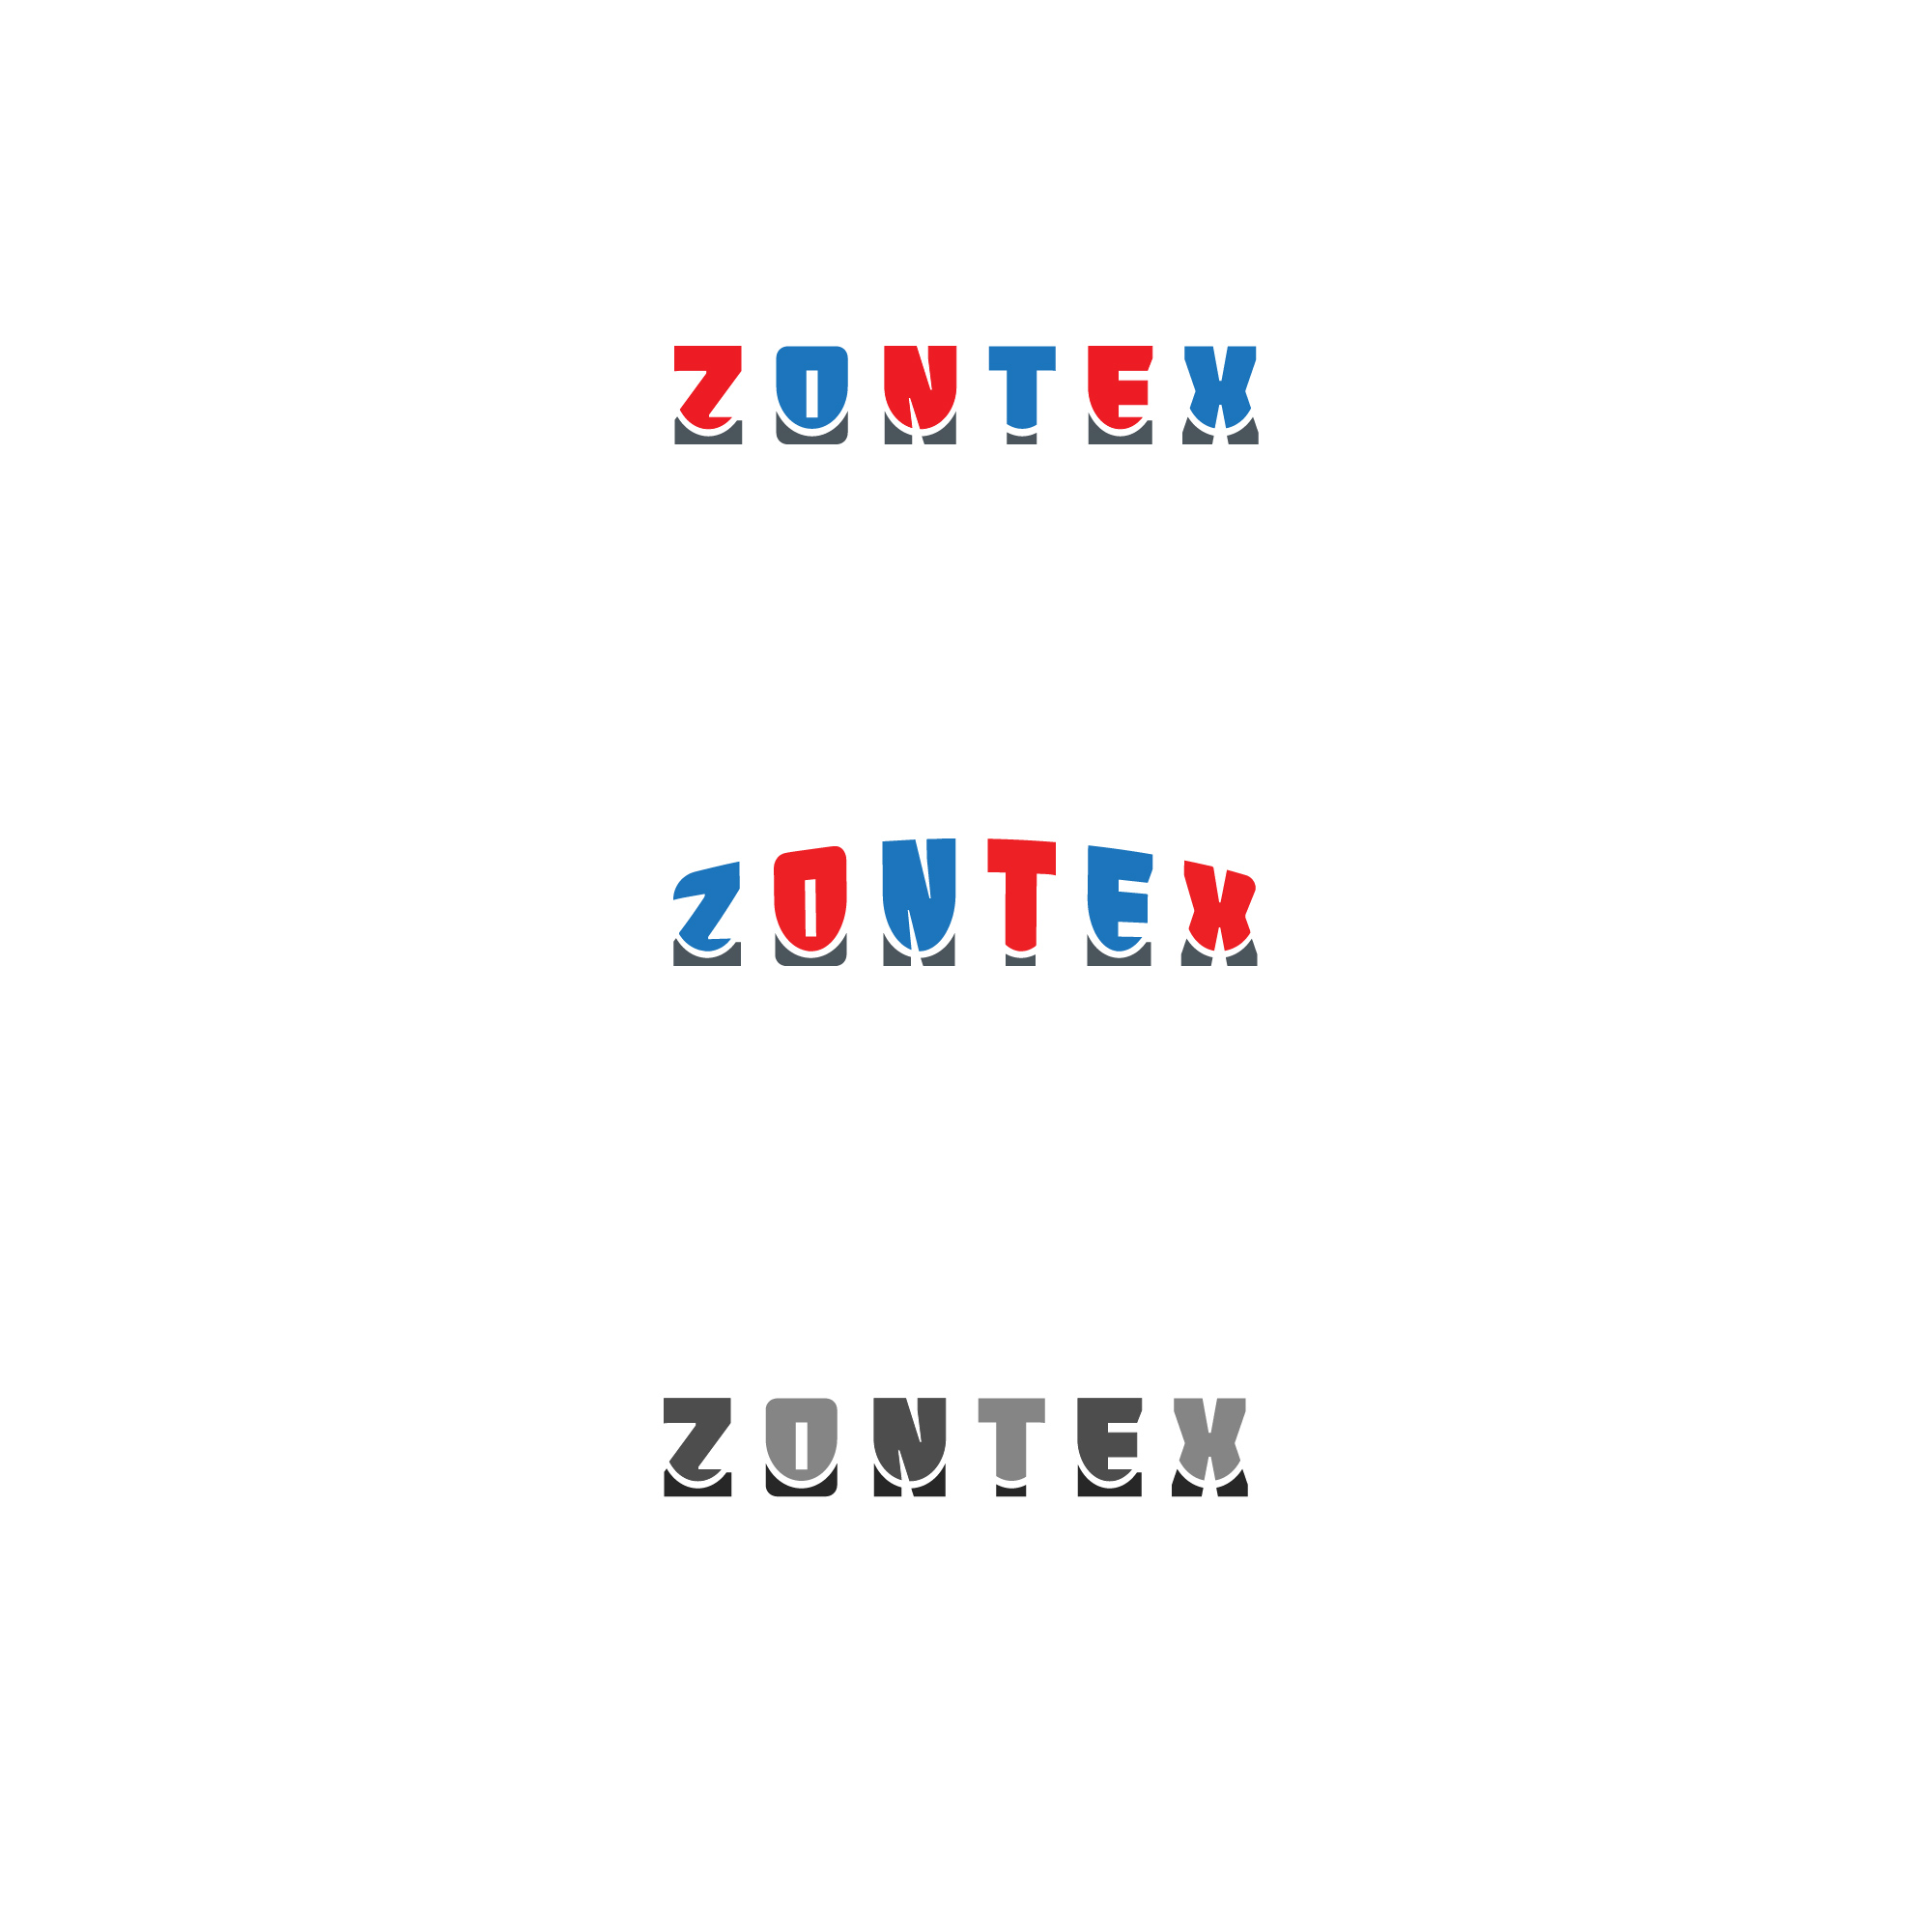 Логотип для интернет проекта фото f_4175a29d4bac7717.jpg